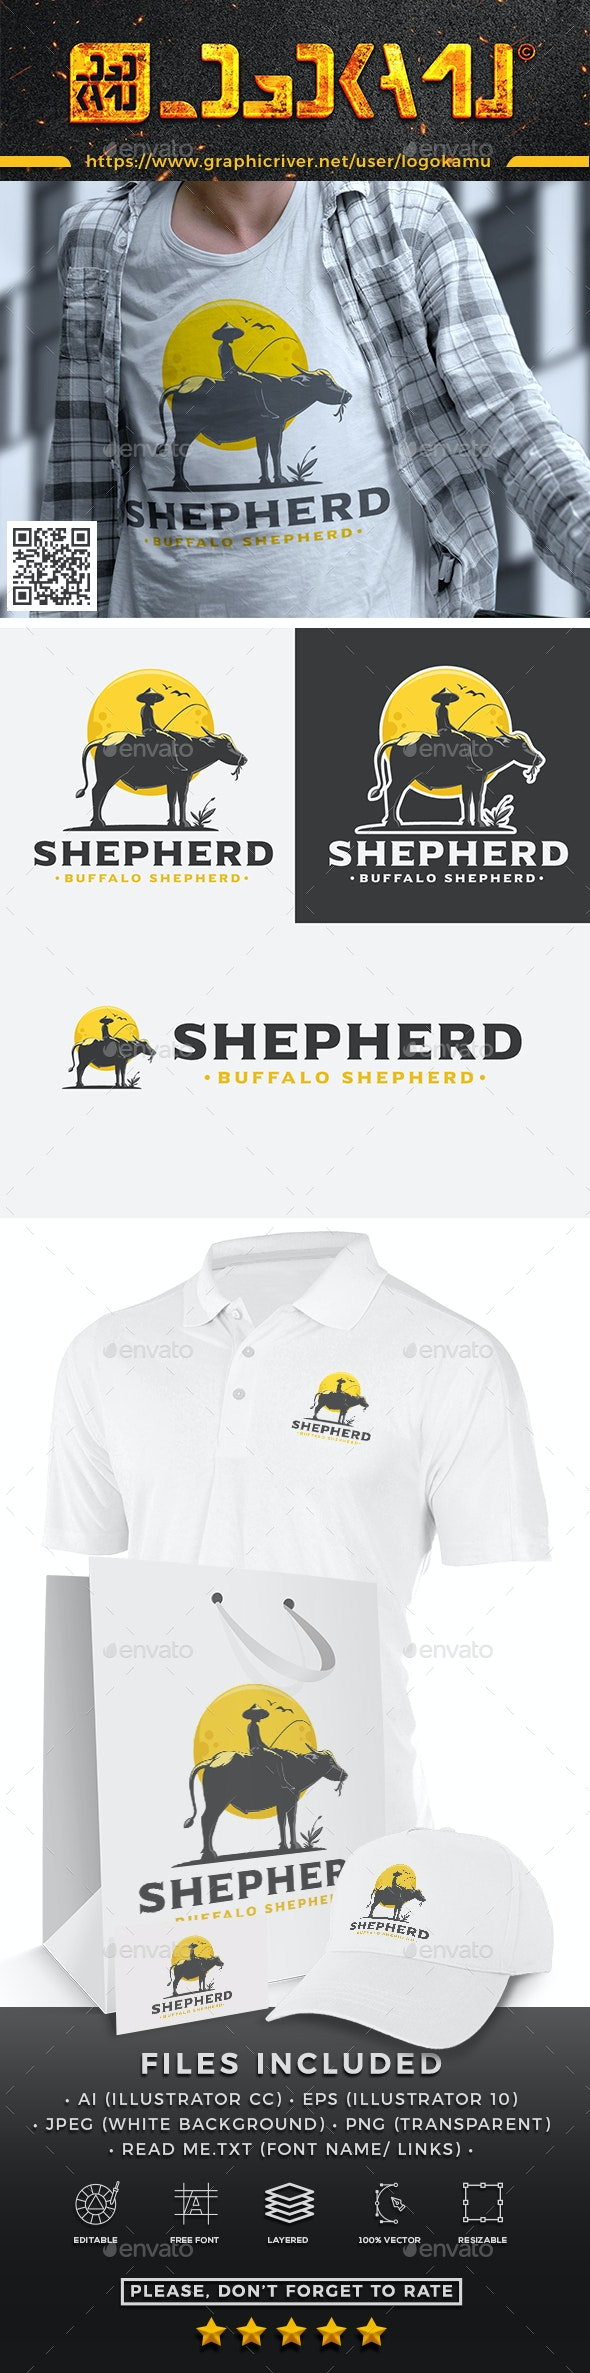 Buffalo Shepherd Logo - Nature Logo Templates